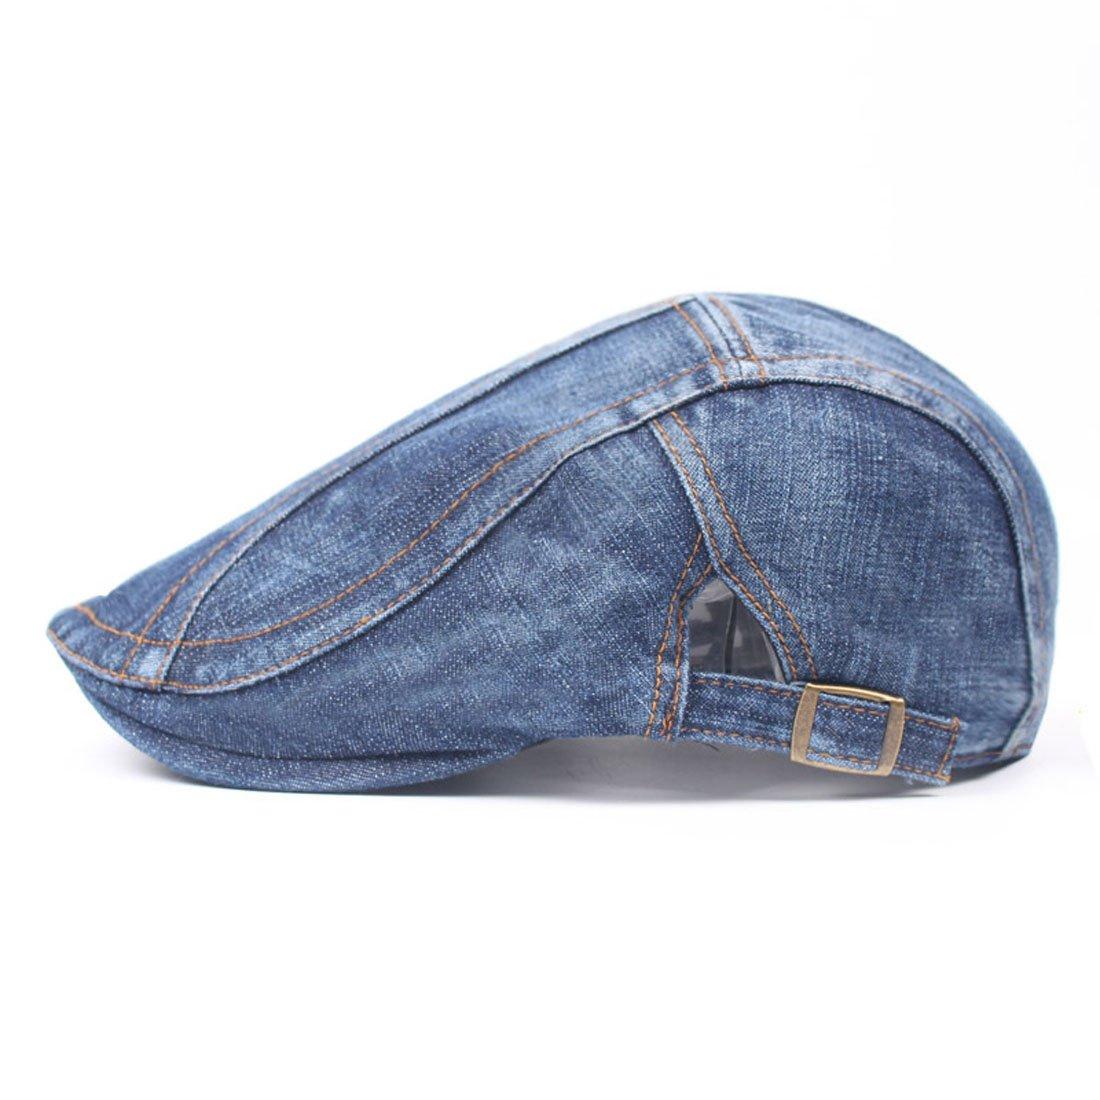 King Star Men Cotton Flat Cap Hat Ivy Irish Cabbie Newsboy Scally Cap